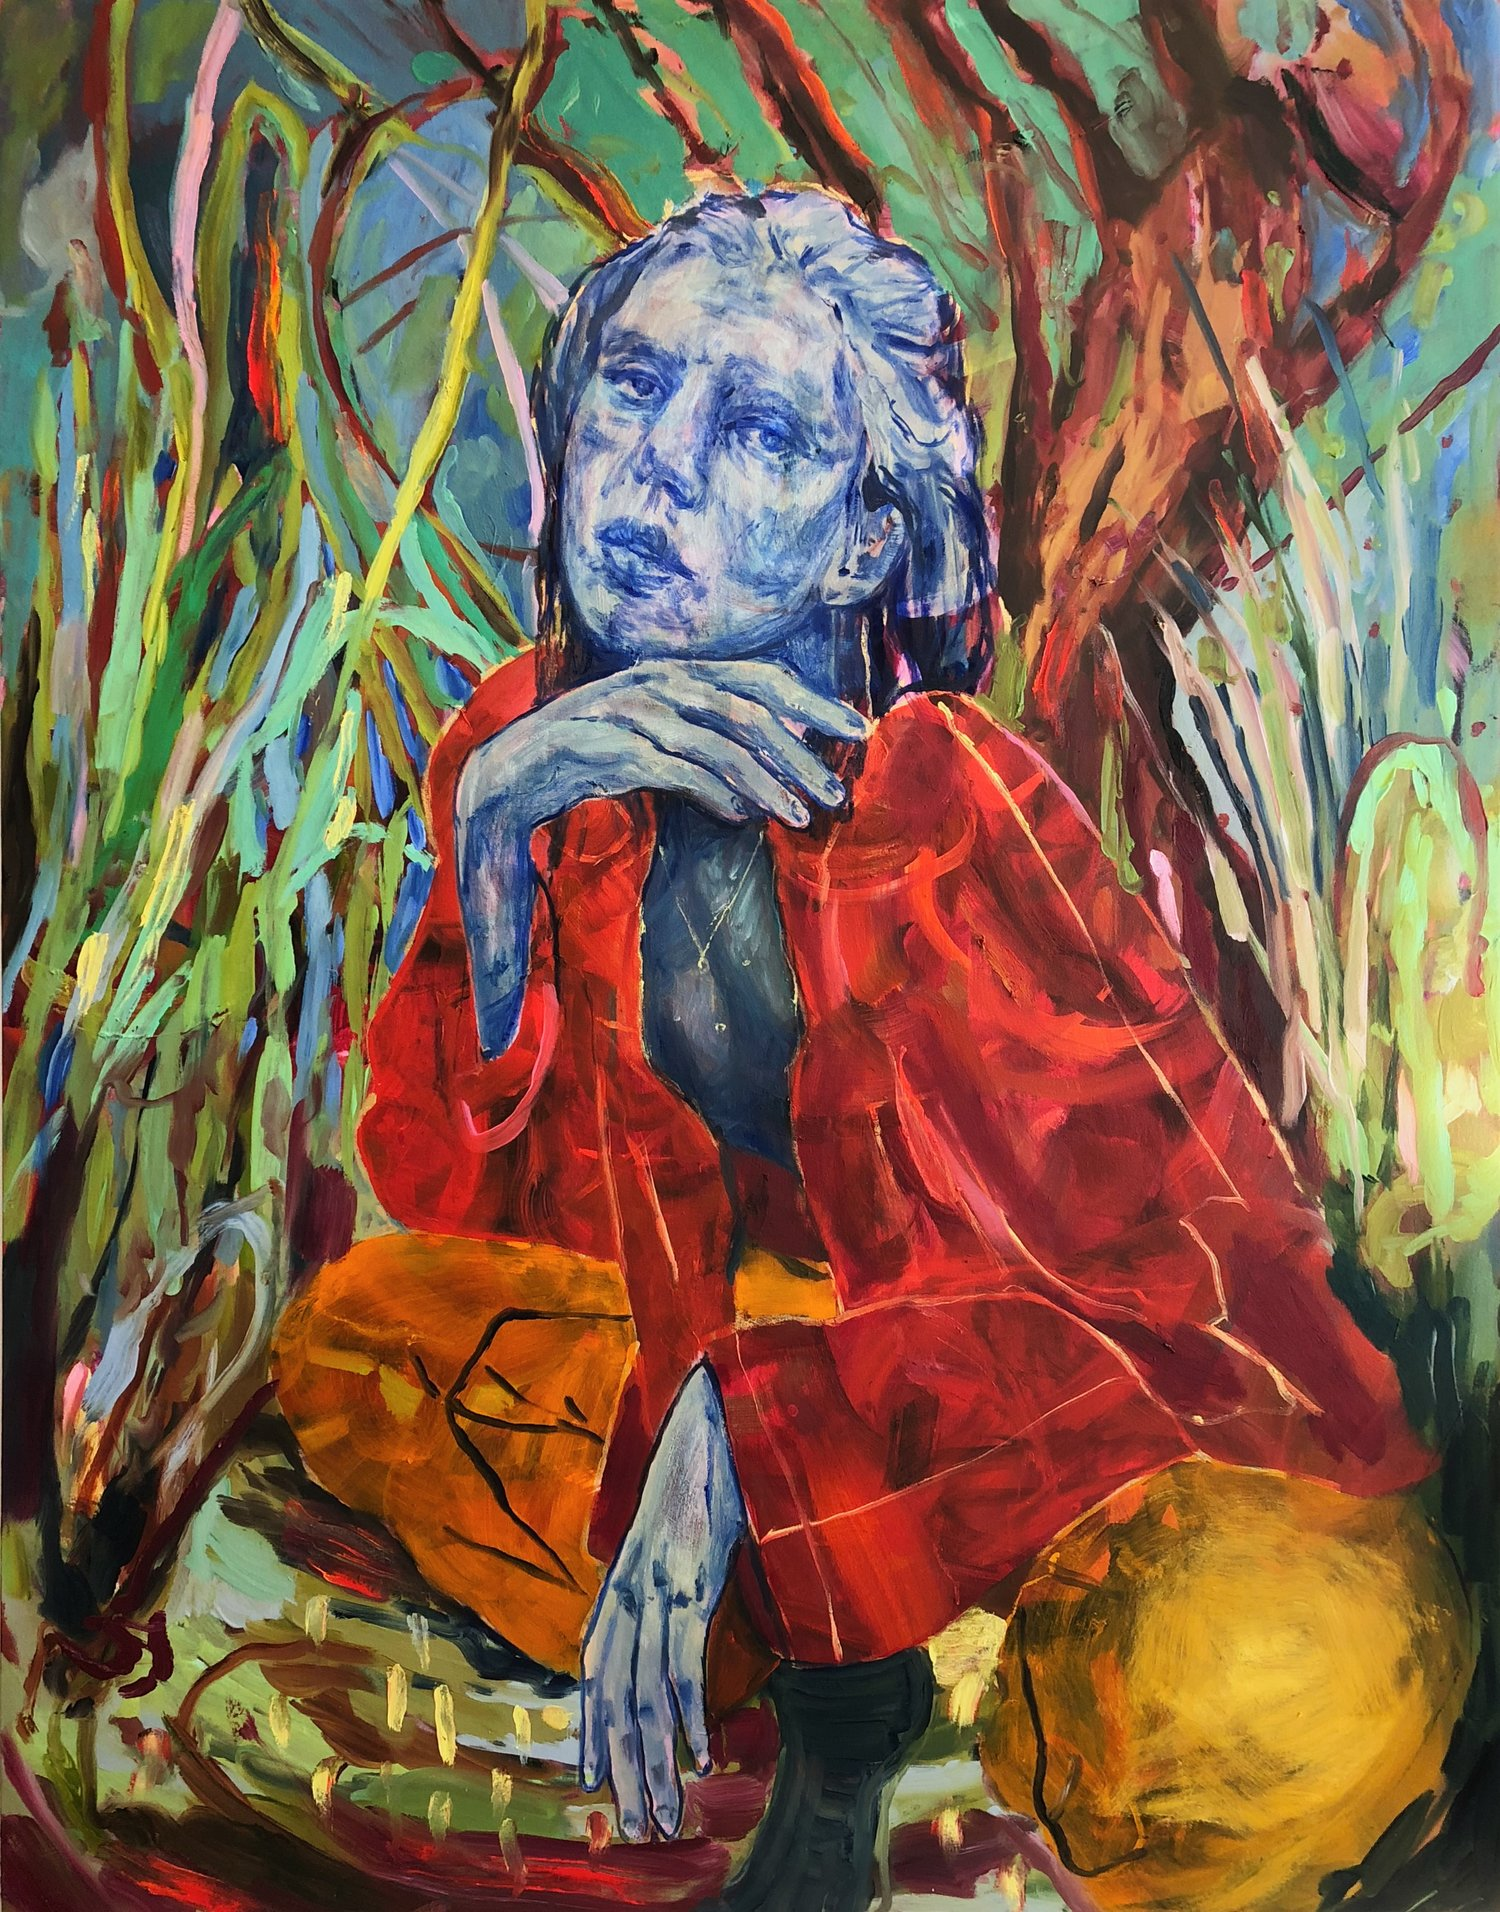 Kayla CAROLINE ABSHER oil on canvas 64 x 50 in